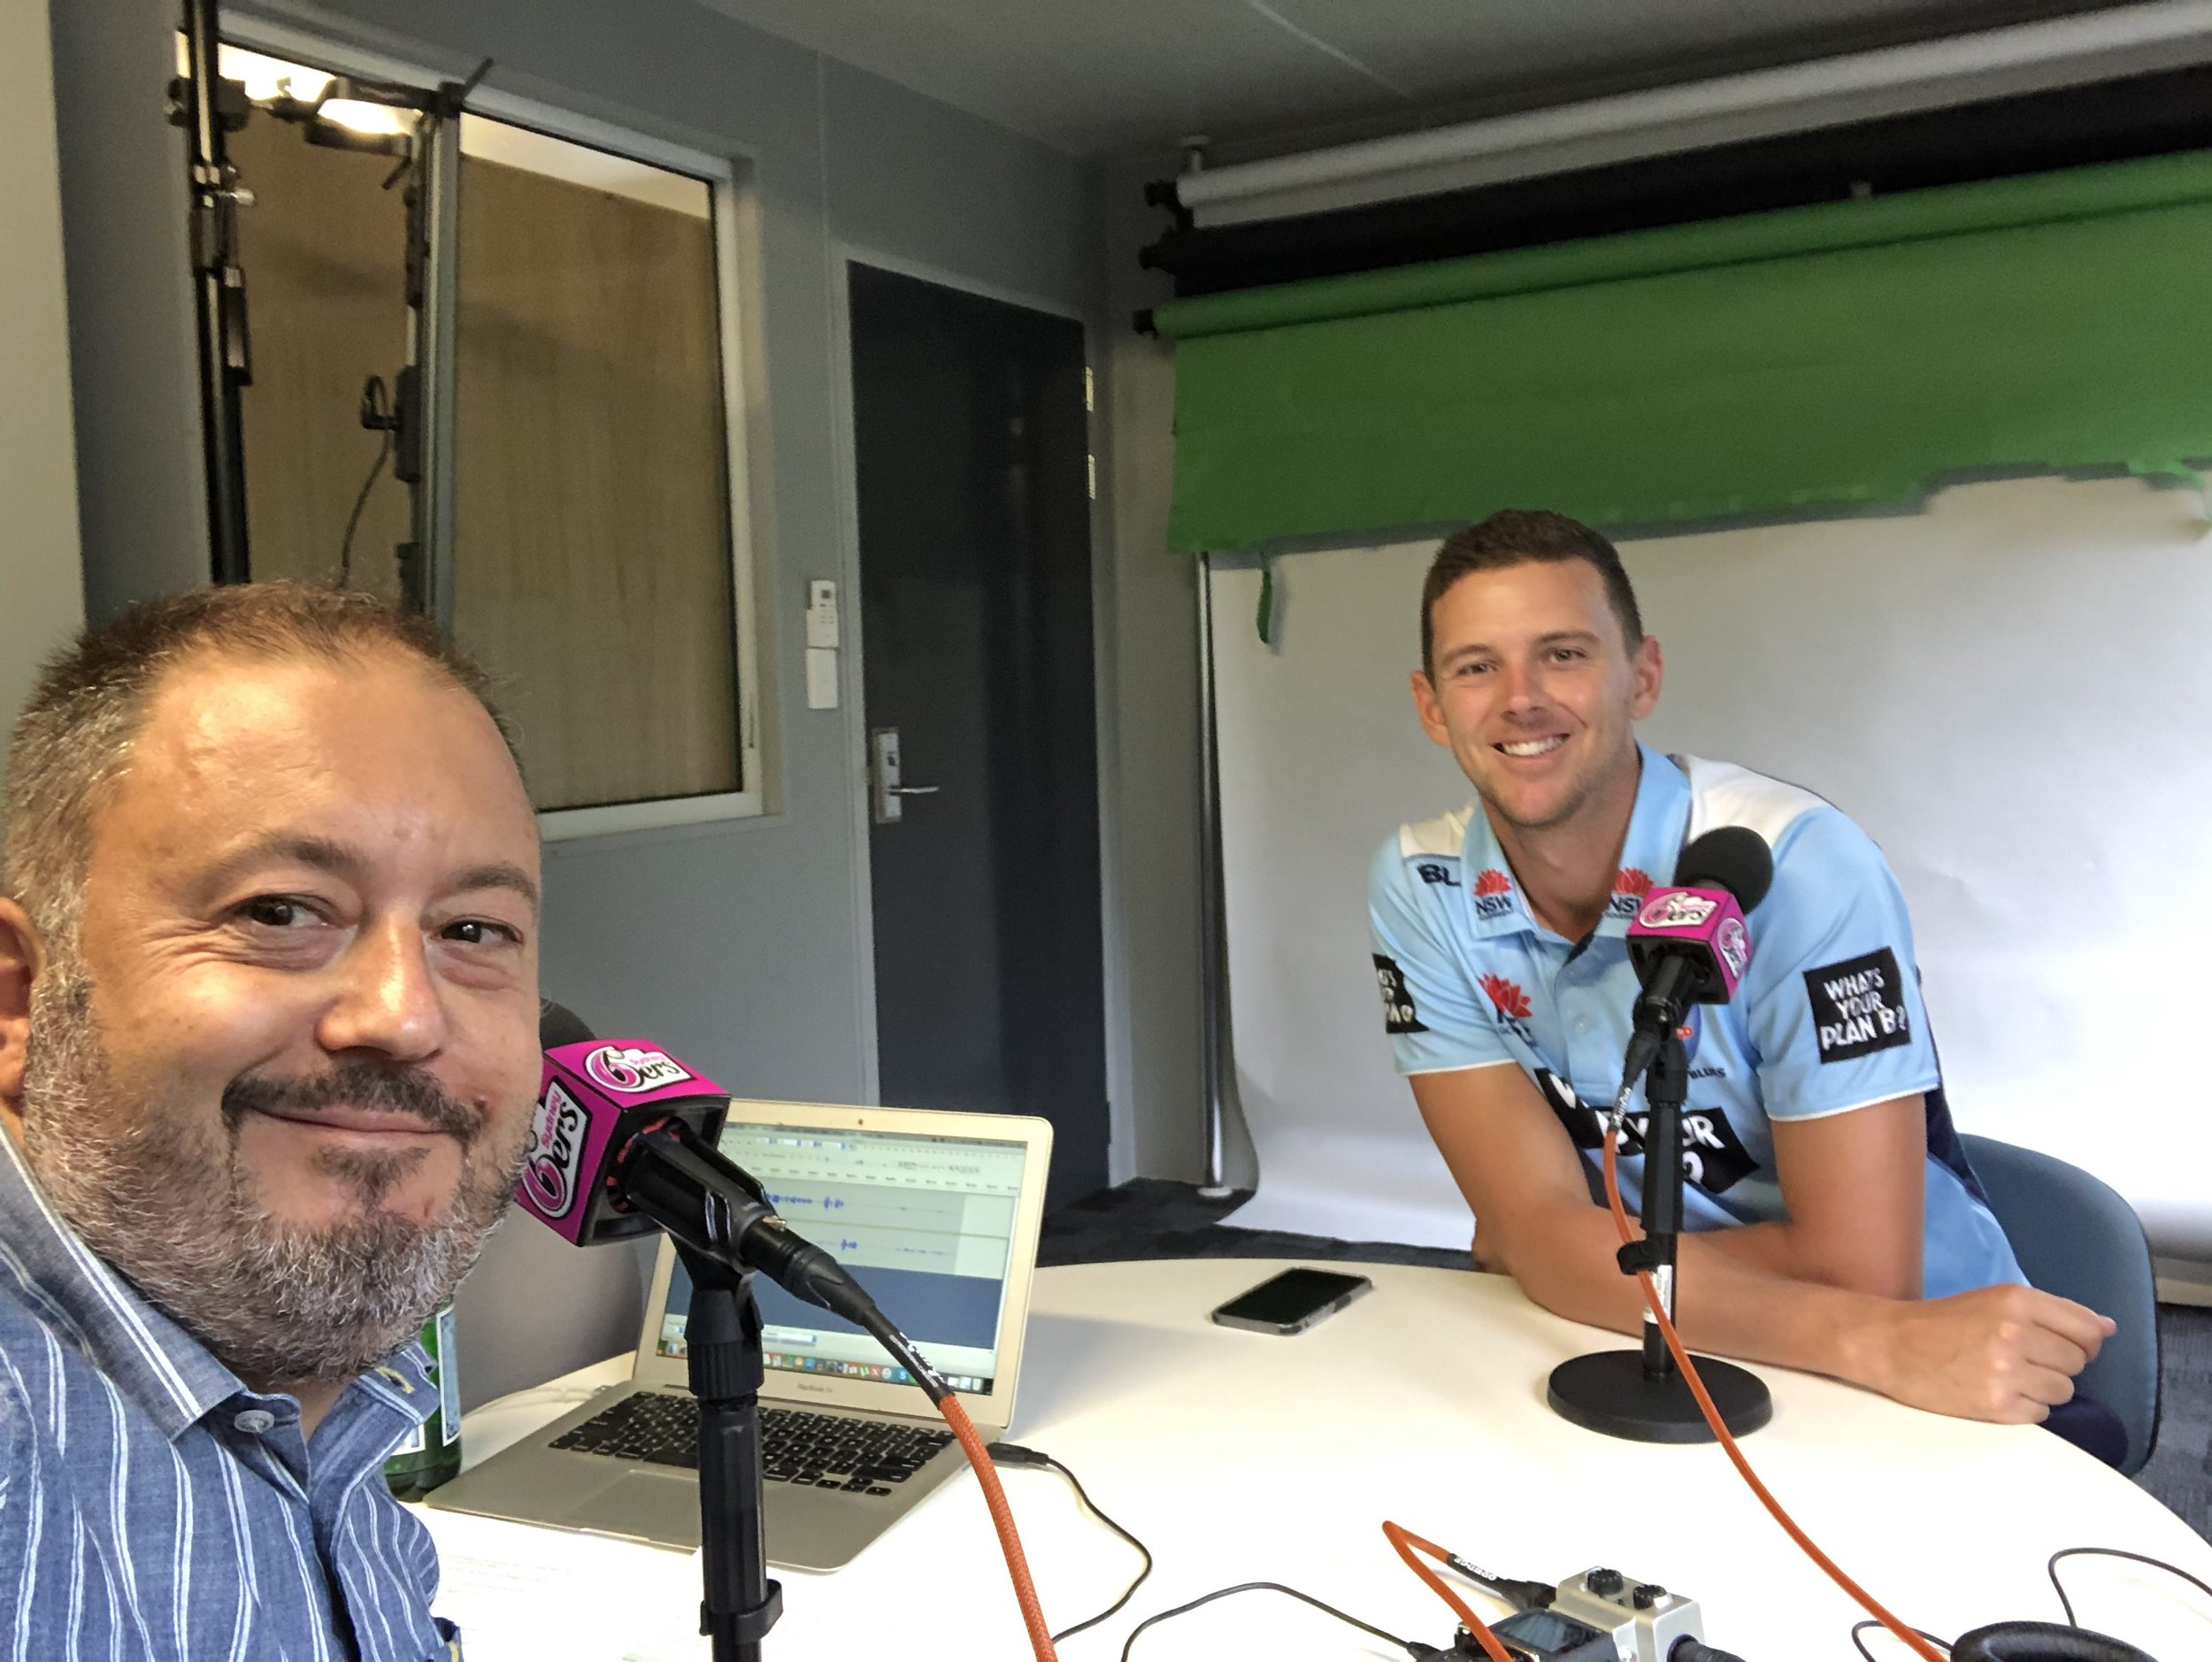 Andrew interviewing Australian fast bowler Josh Hazlewood